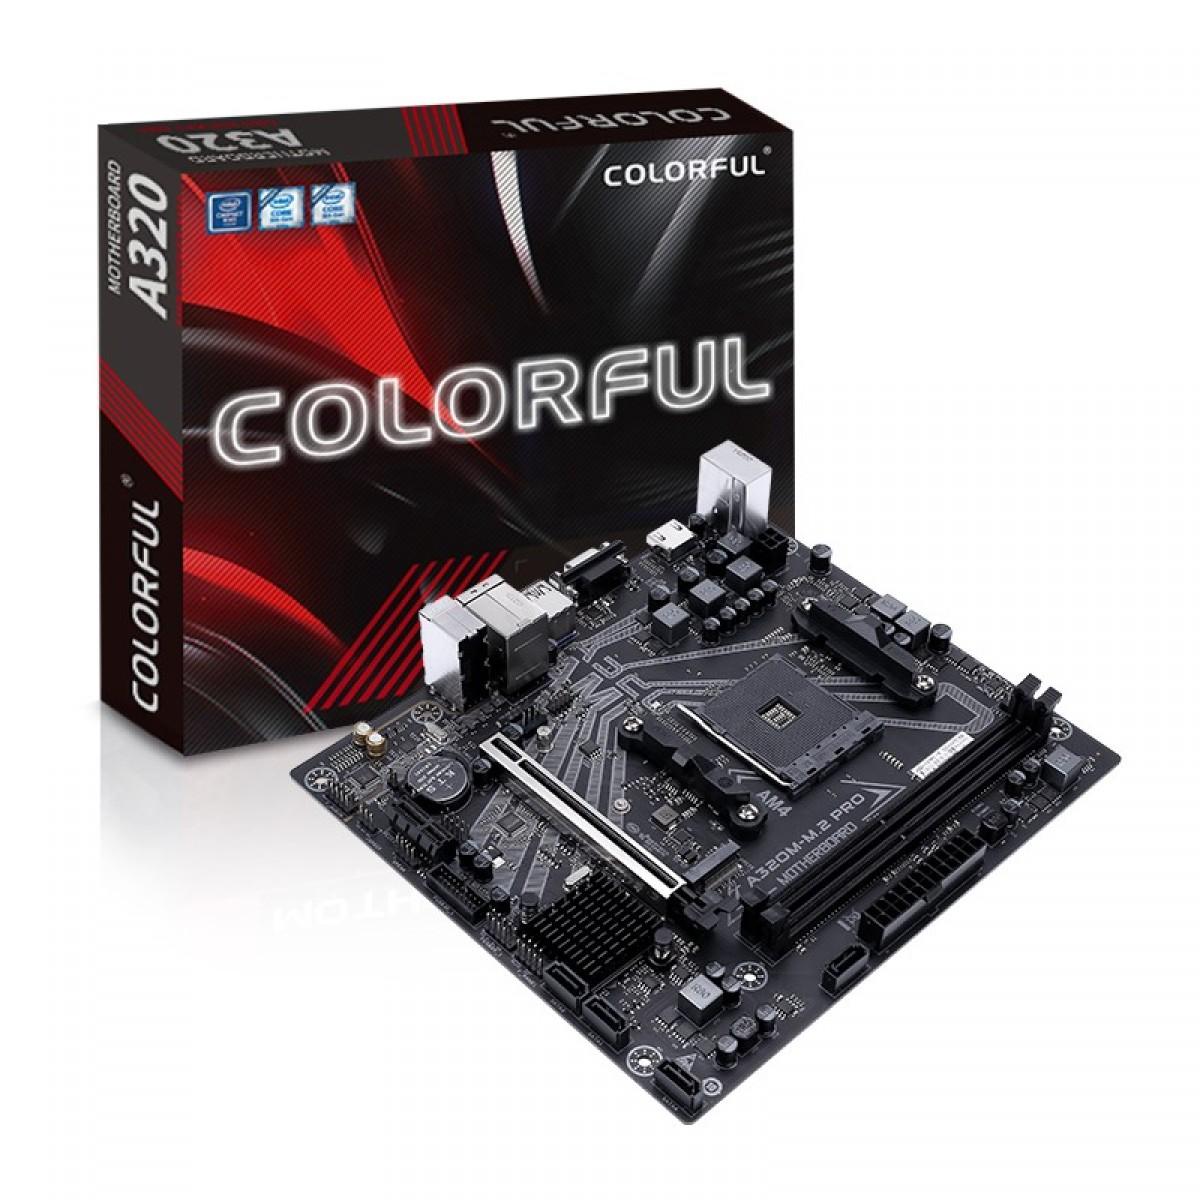 Placa Mãe Colorful A320M-M.2 PRO V15, Chipset A320, AMD AM4, MATX, DDR4